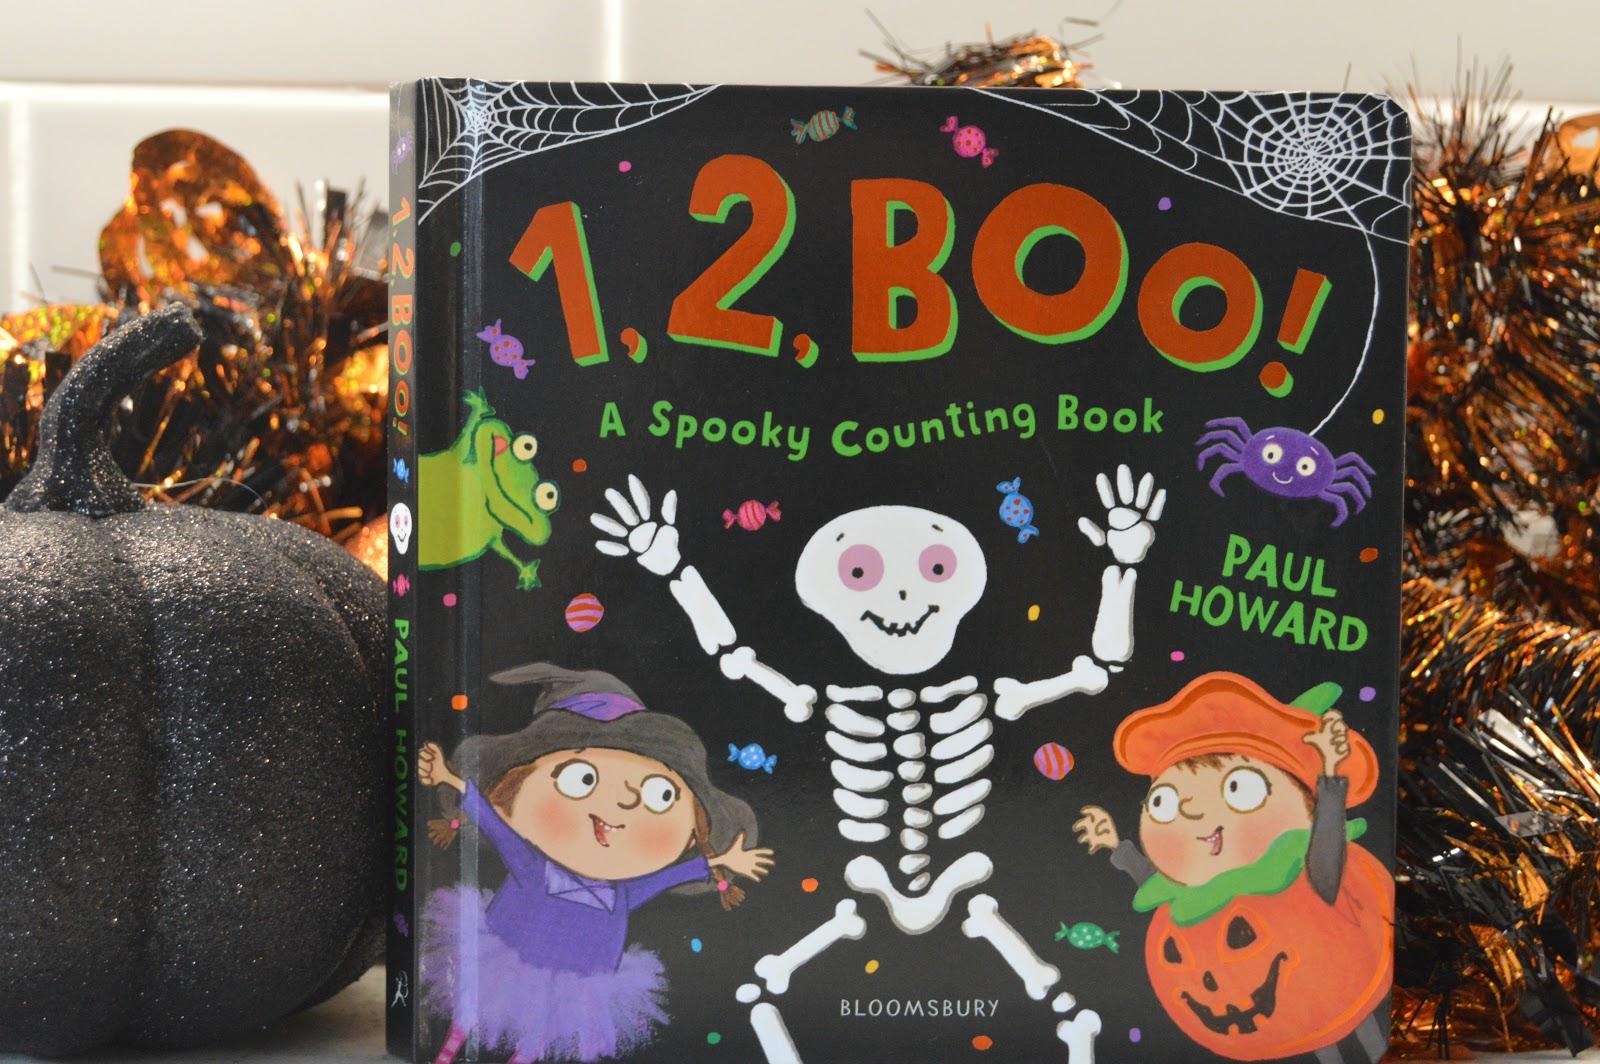 1,2,Boo Book